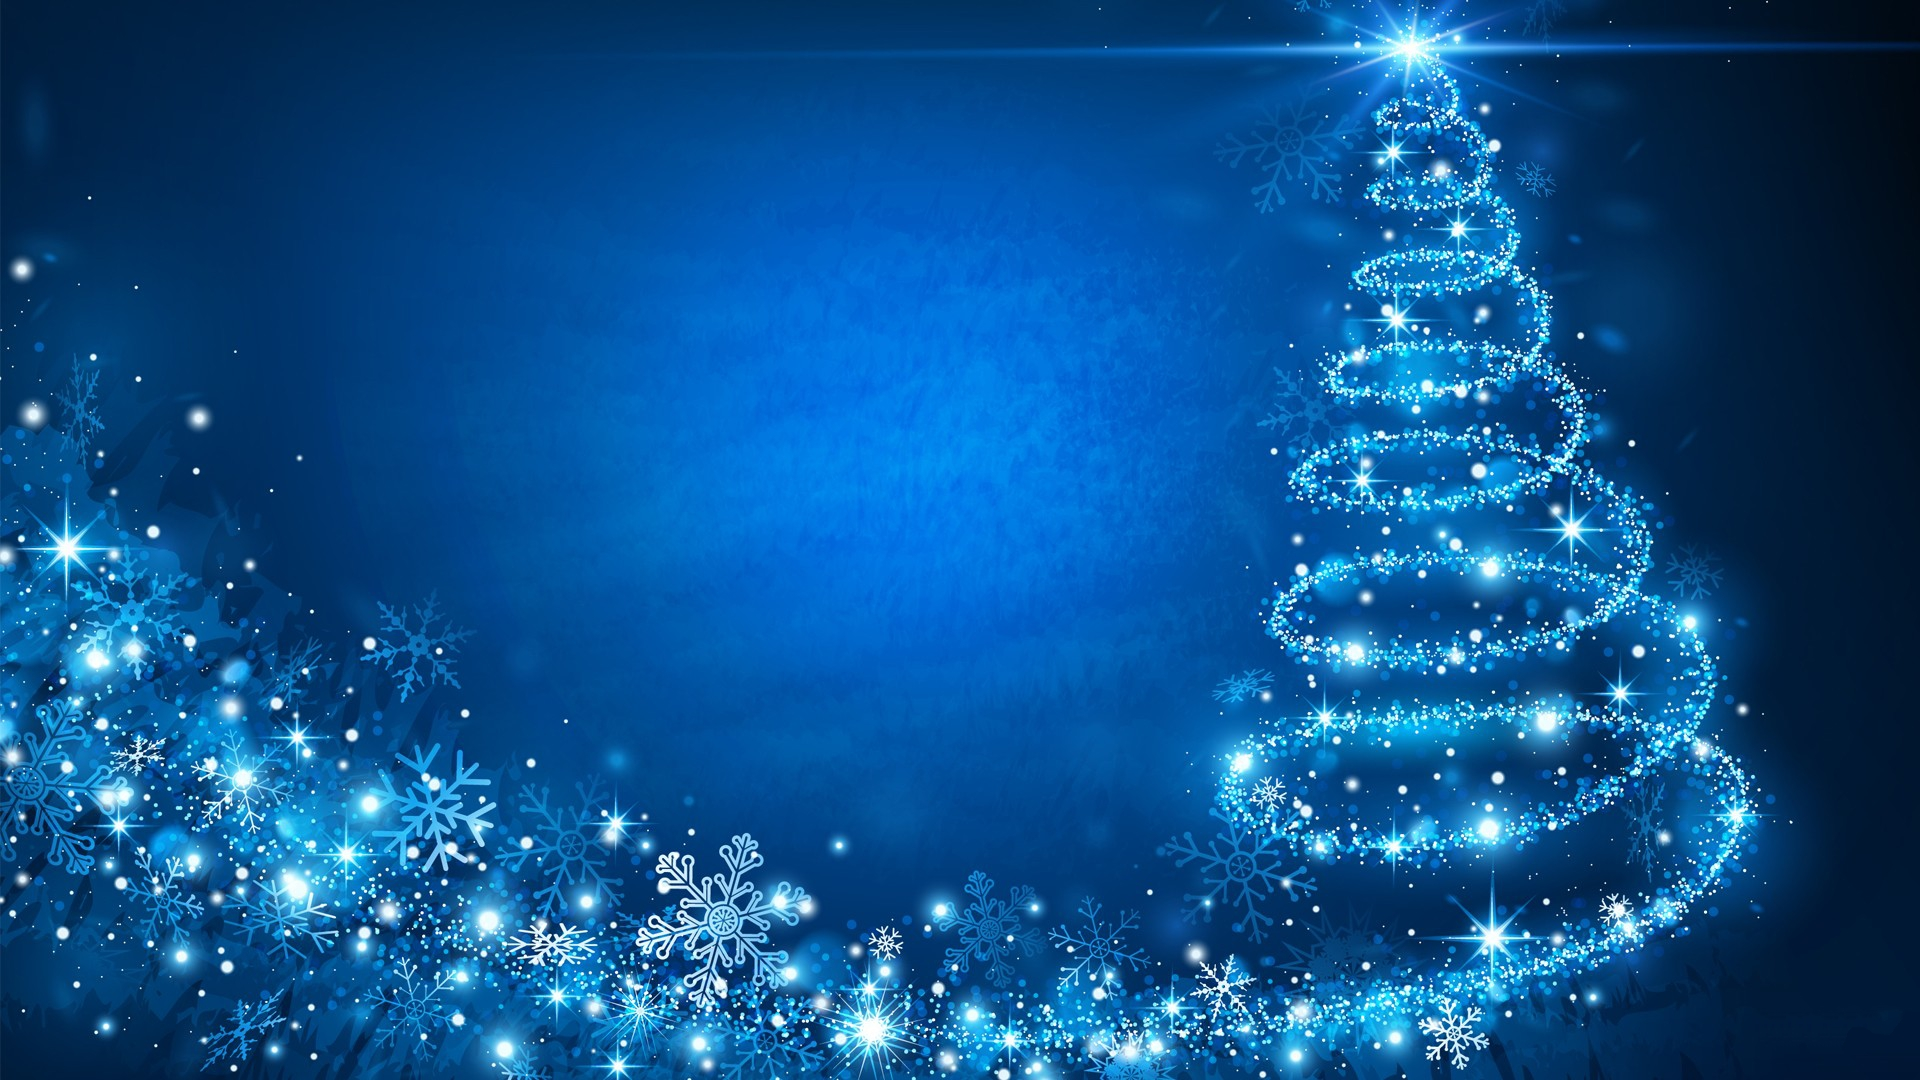 Blue Christmas Wallpaper HD 1920x1080